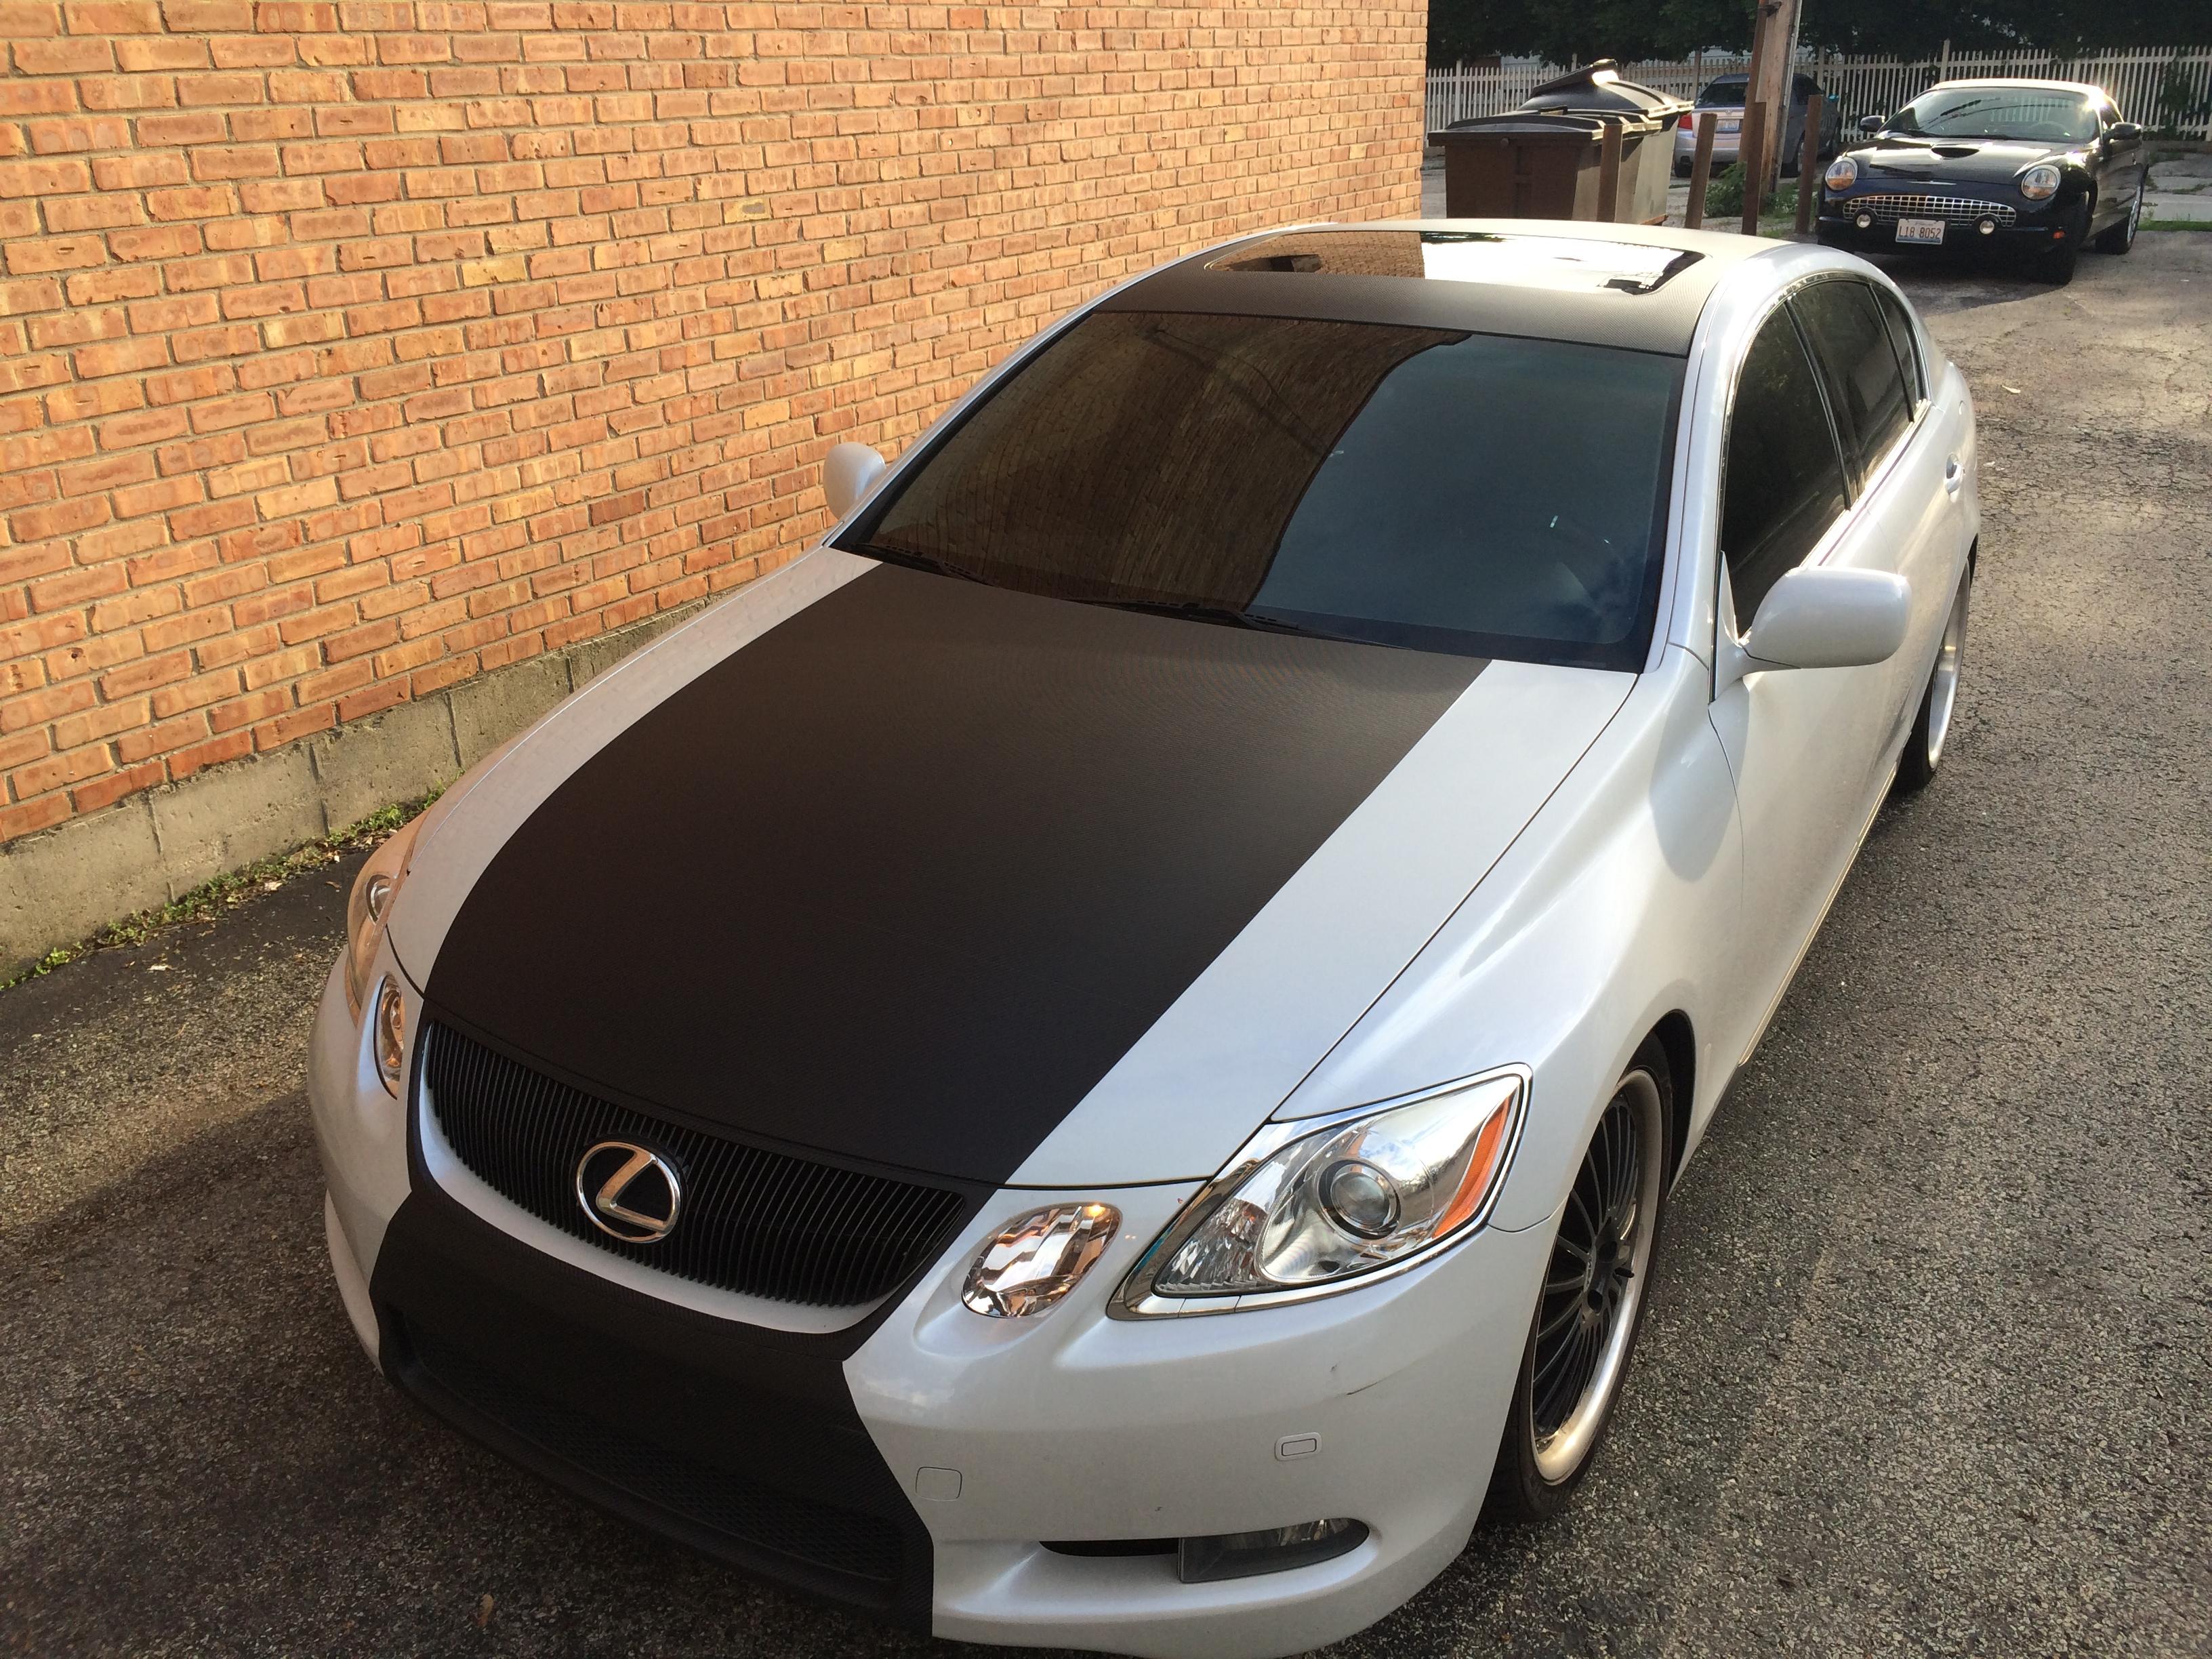 ... Lexus Carbon Fiber Hood Roof Trunk Wrap 3 ...